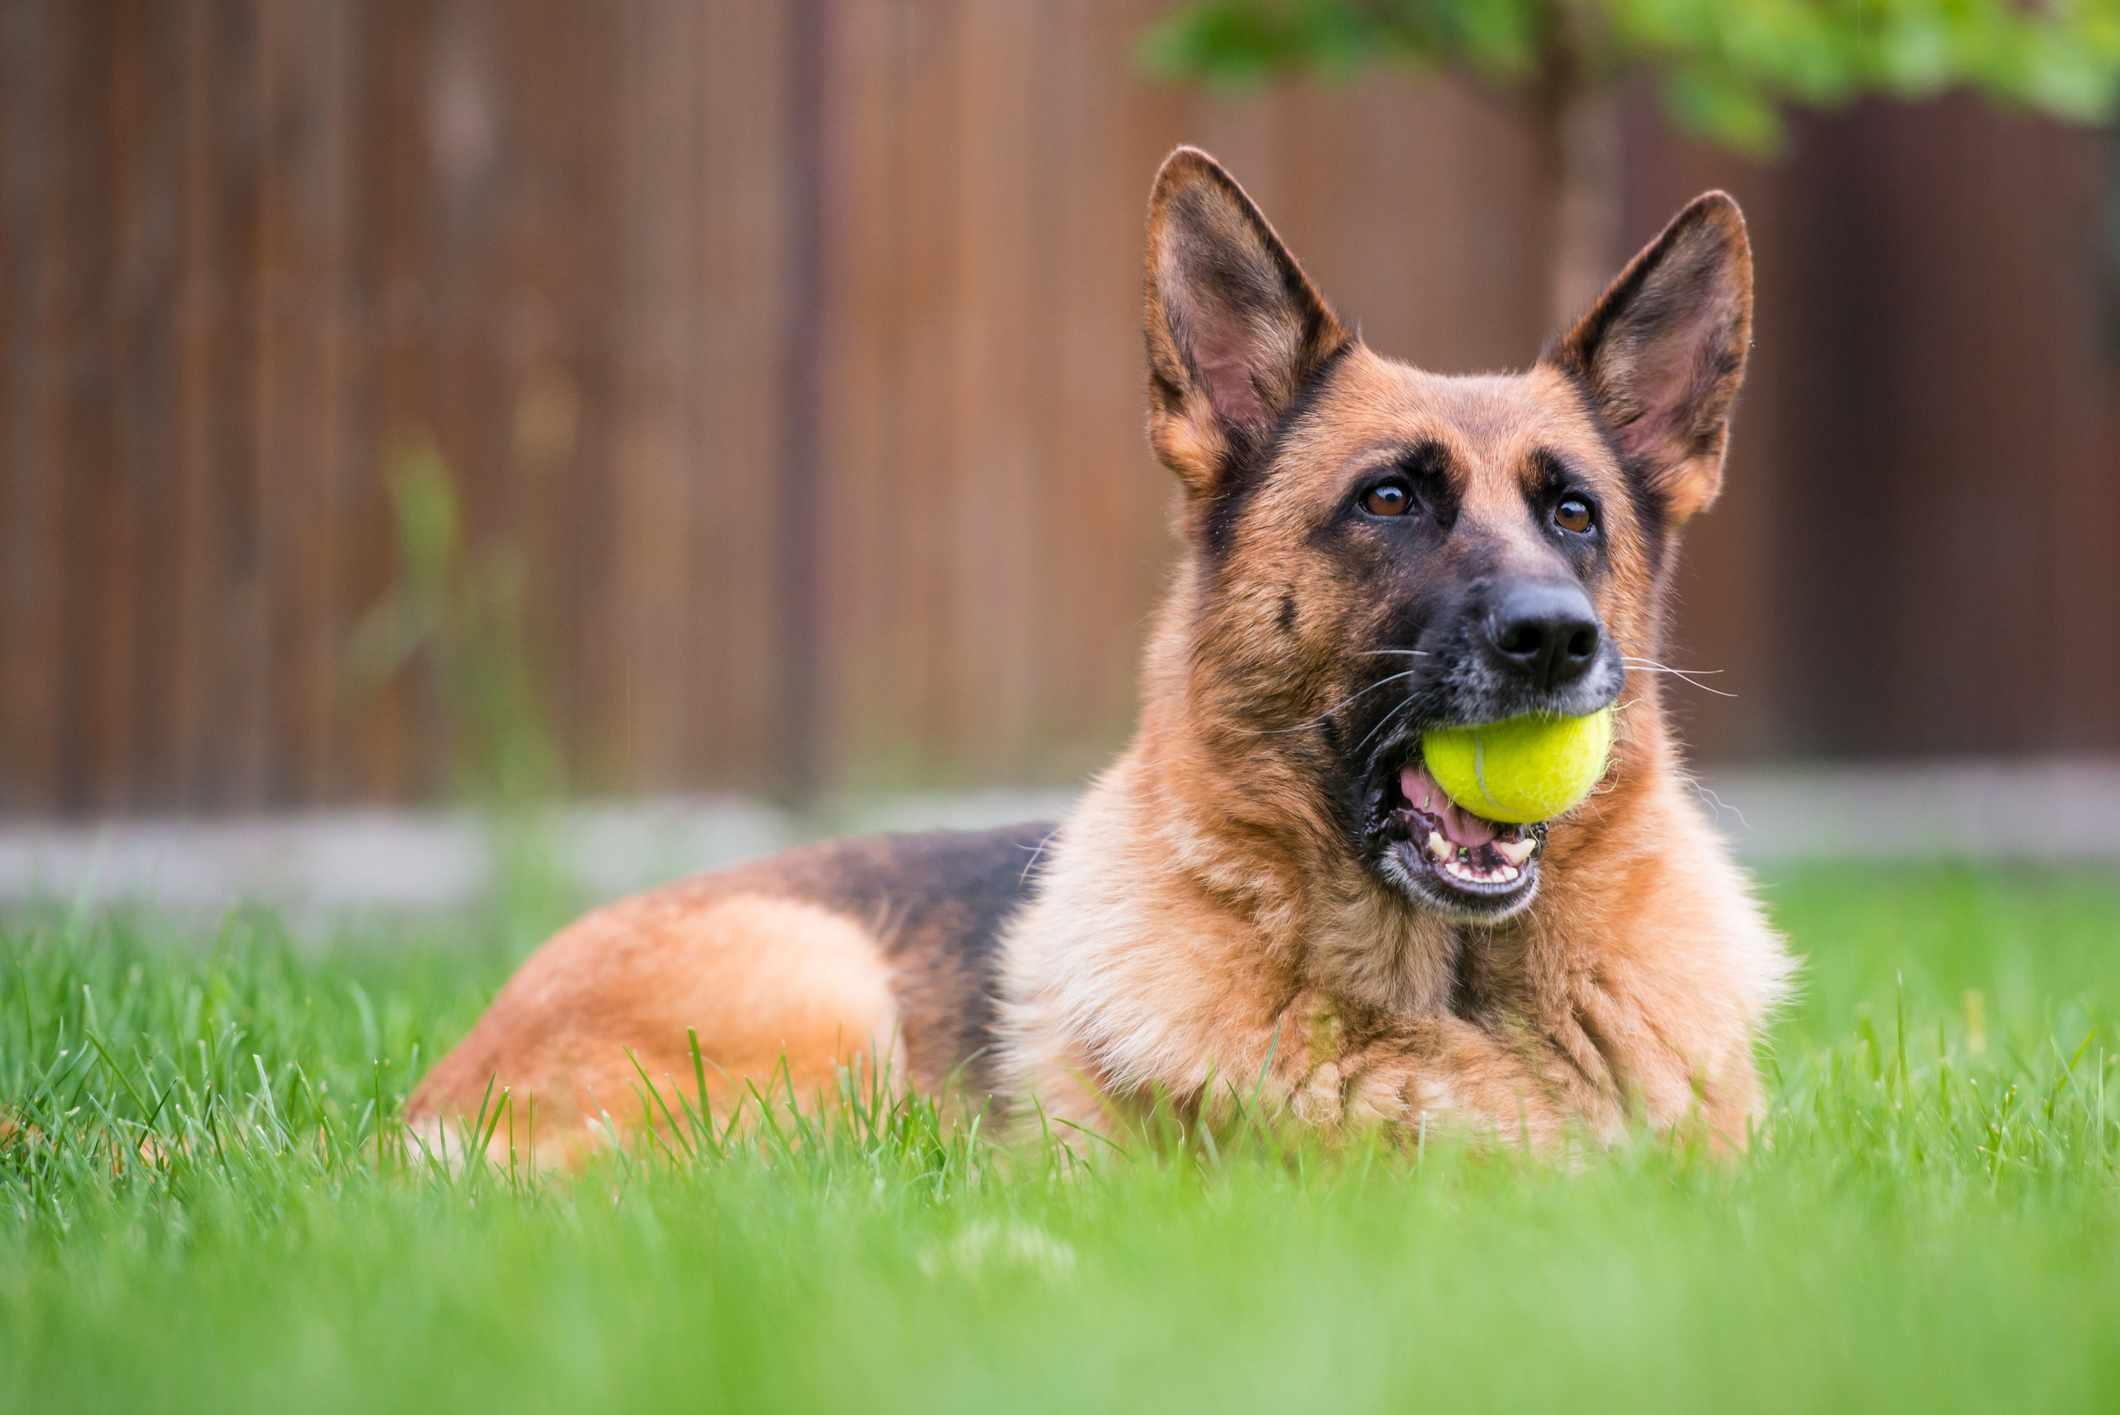 German shepherd with tennis ball